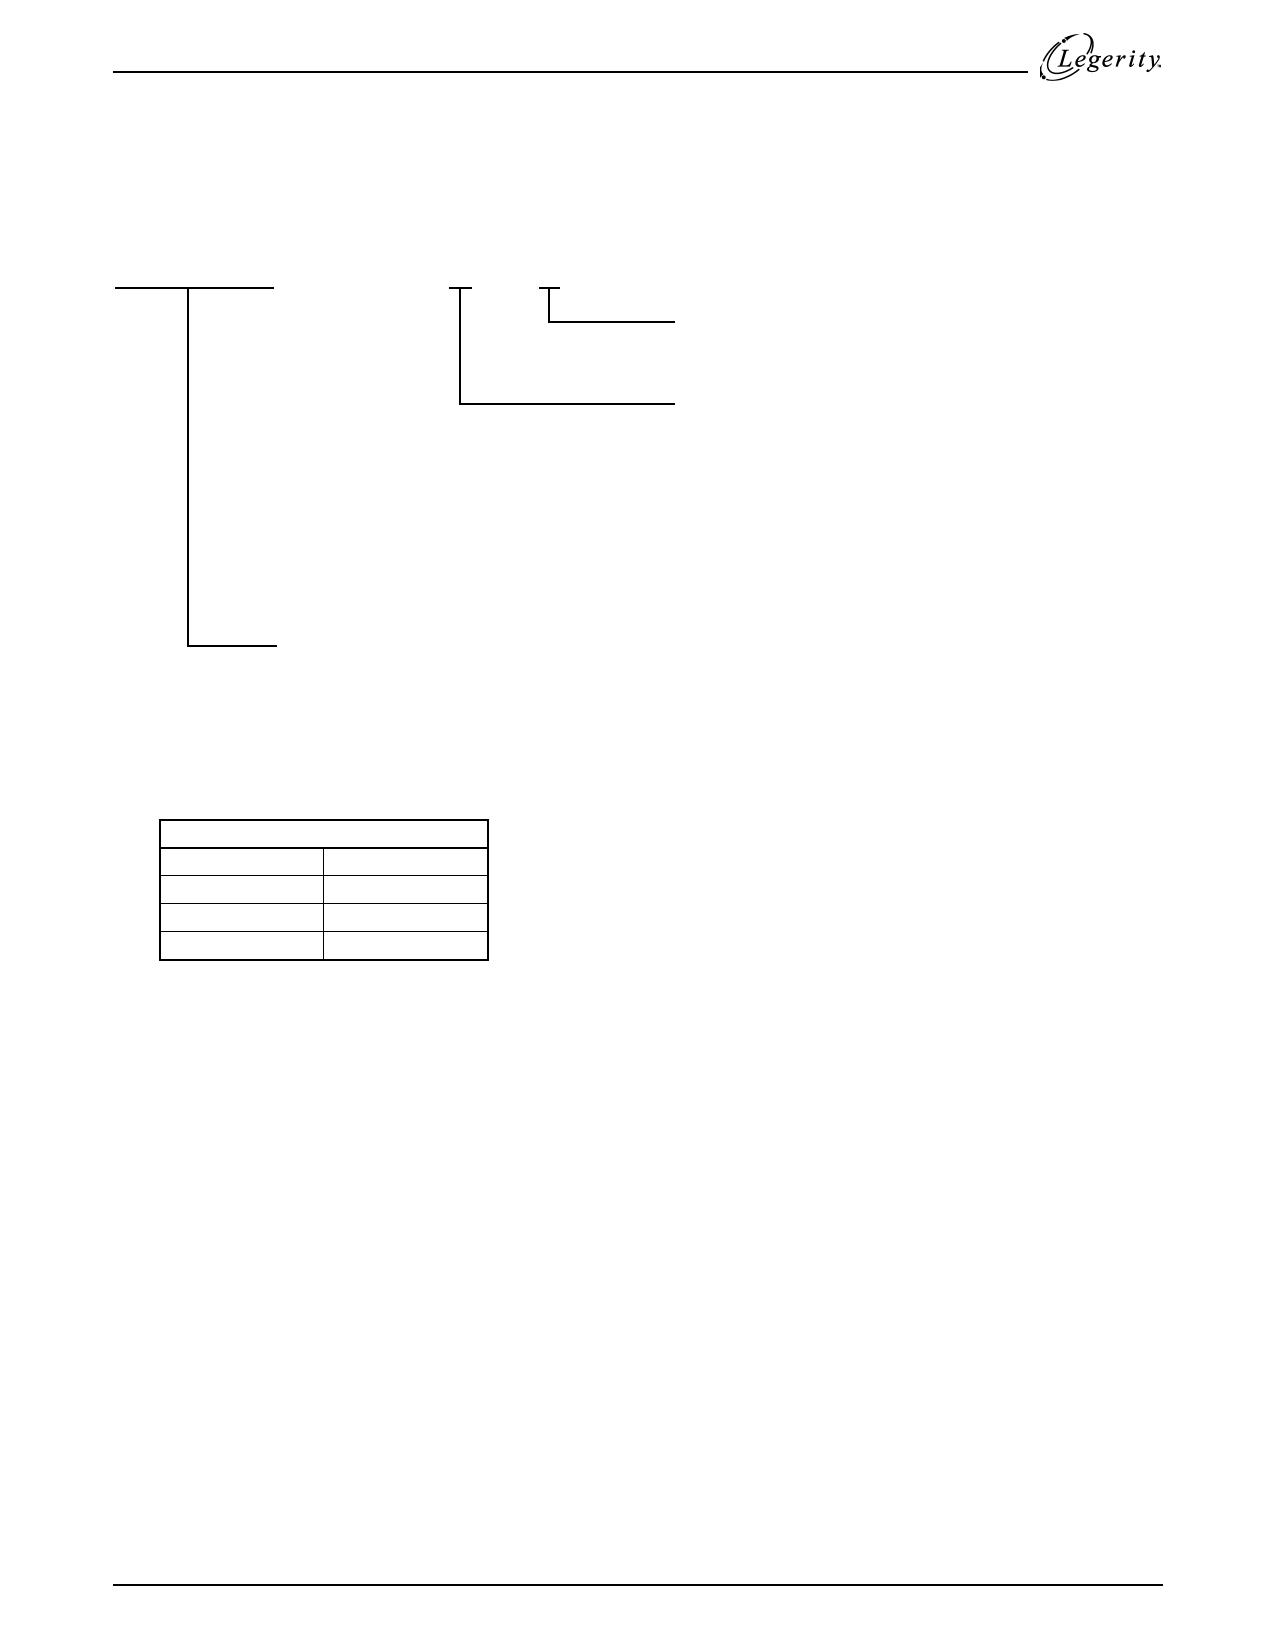 Am79Q021 pdf